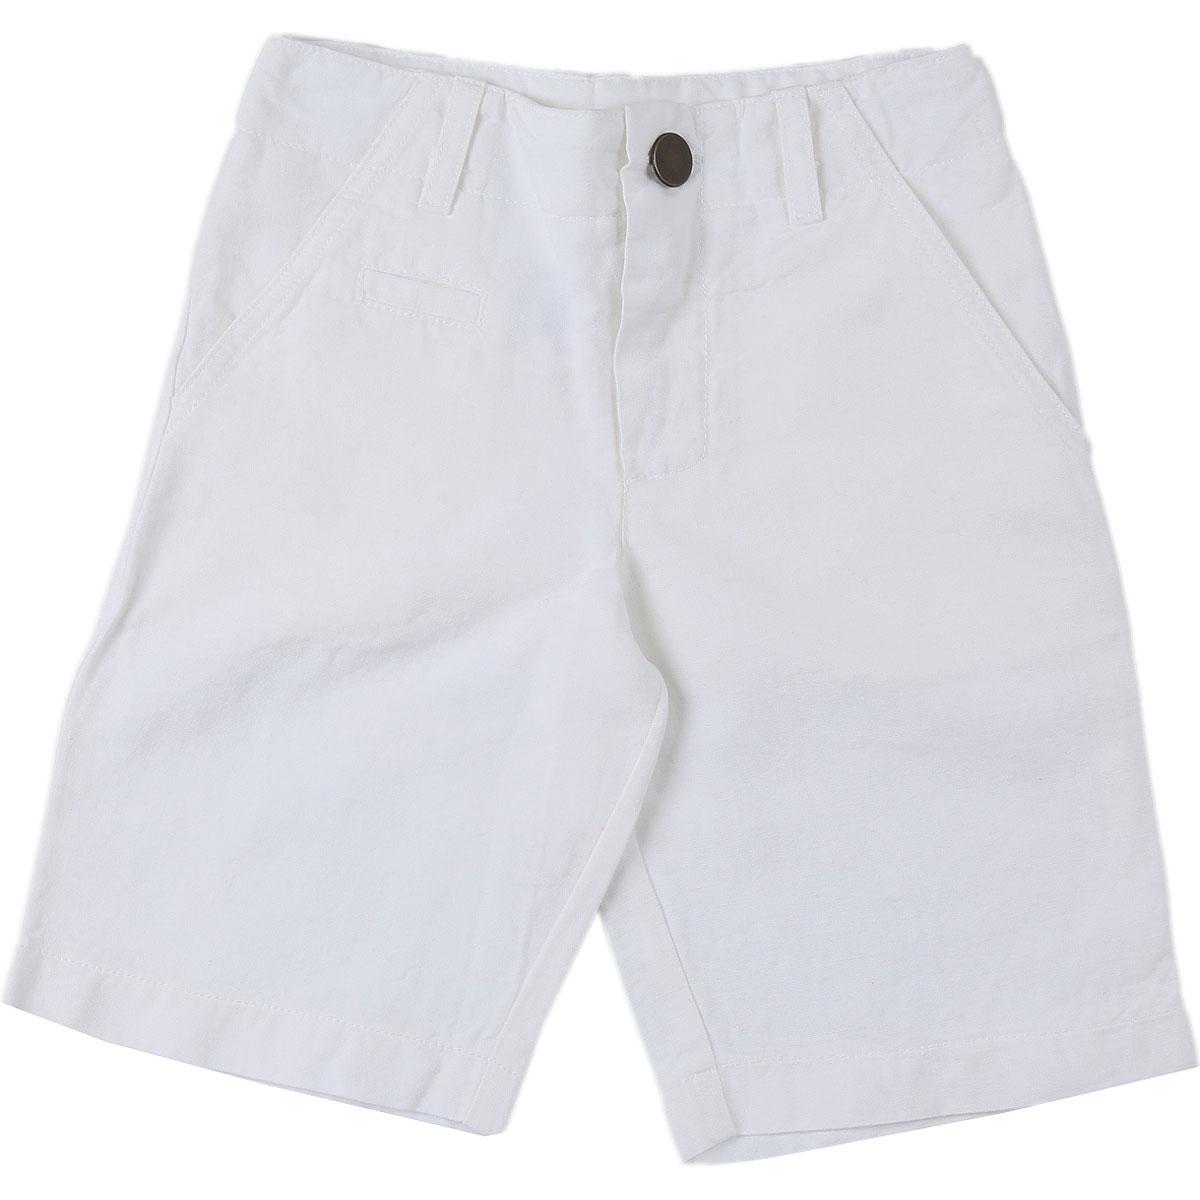 Le Nouveau Ne Baby Shorts for Boys On Sale in Outlet, White, Cotton, 2019, 12 M 2Y